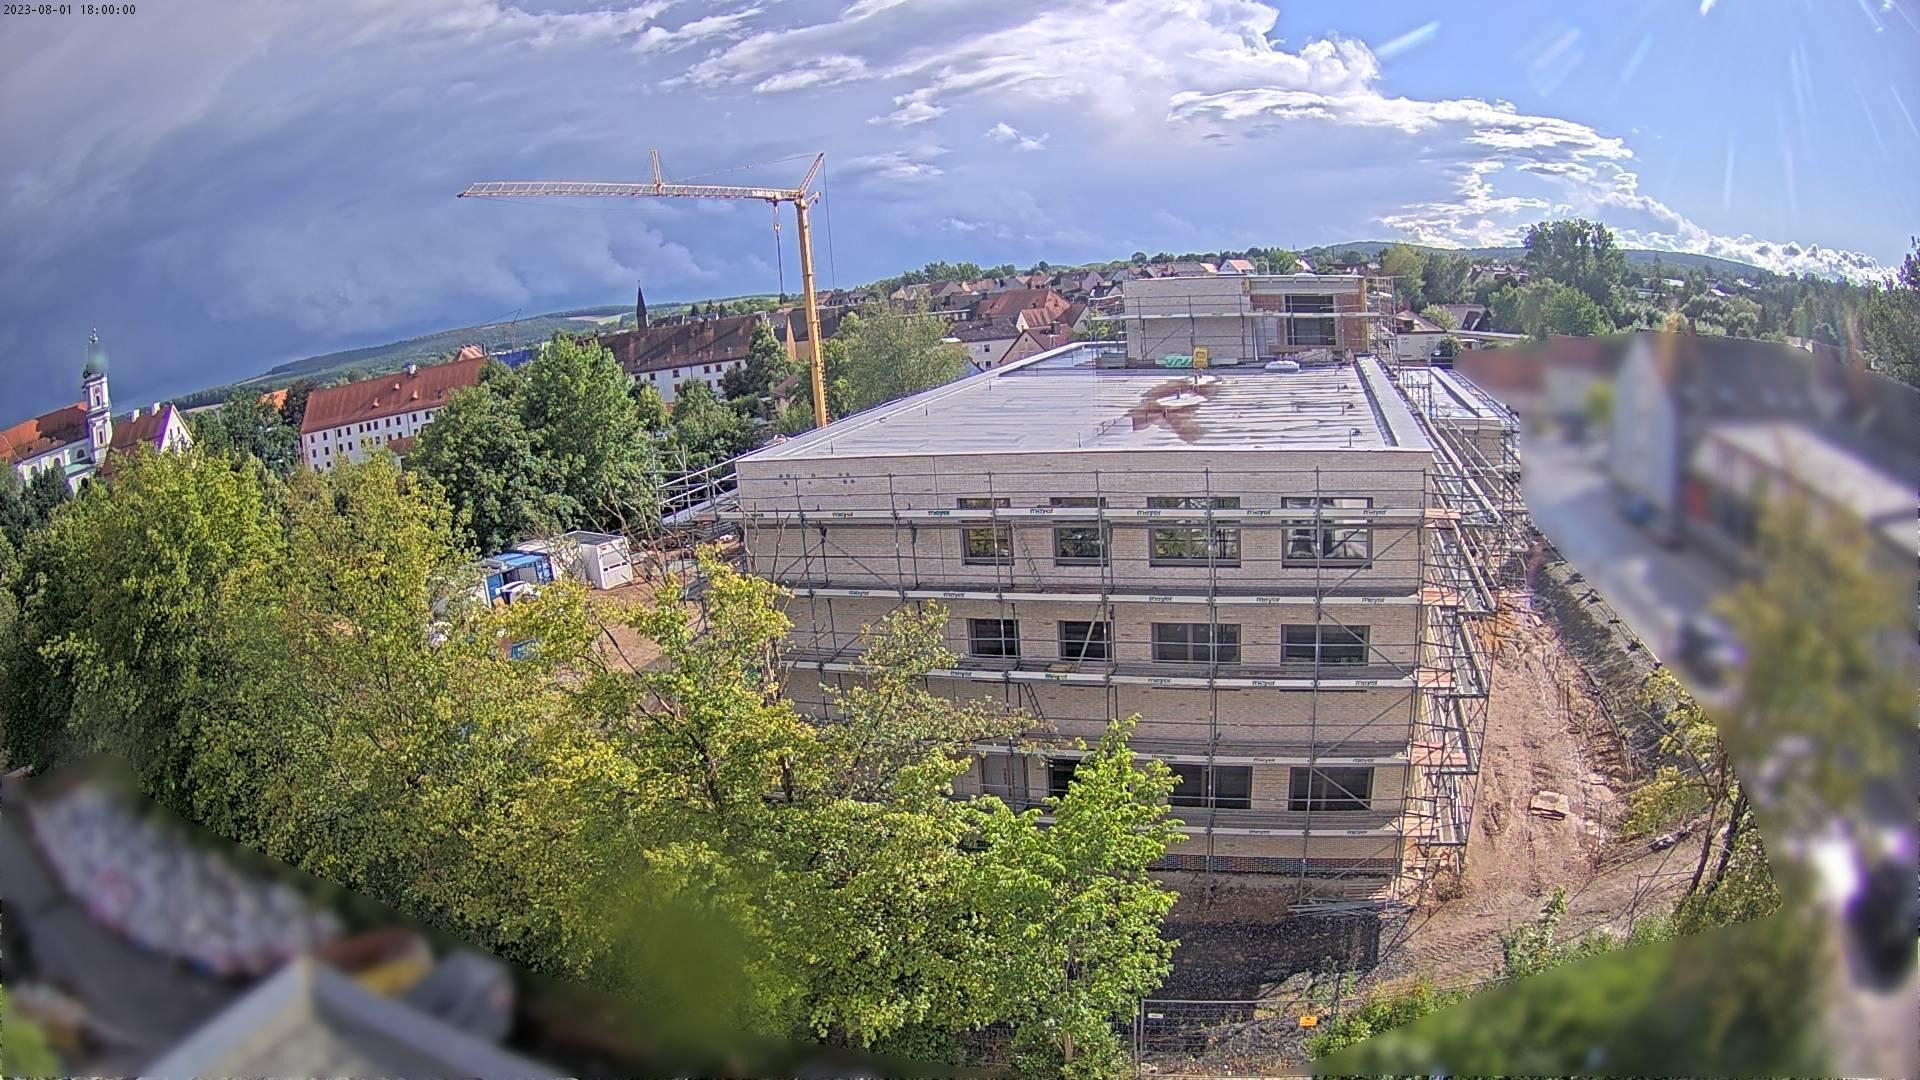 https://portal1794.webcam-profi.de/cam1/image.jpg